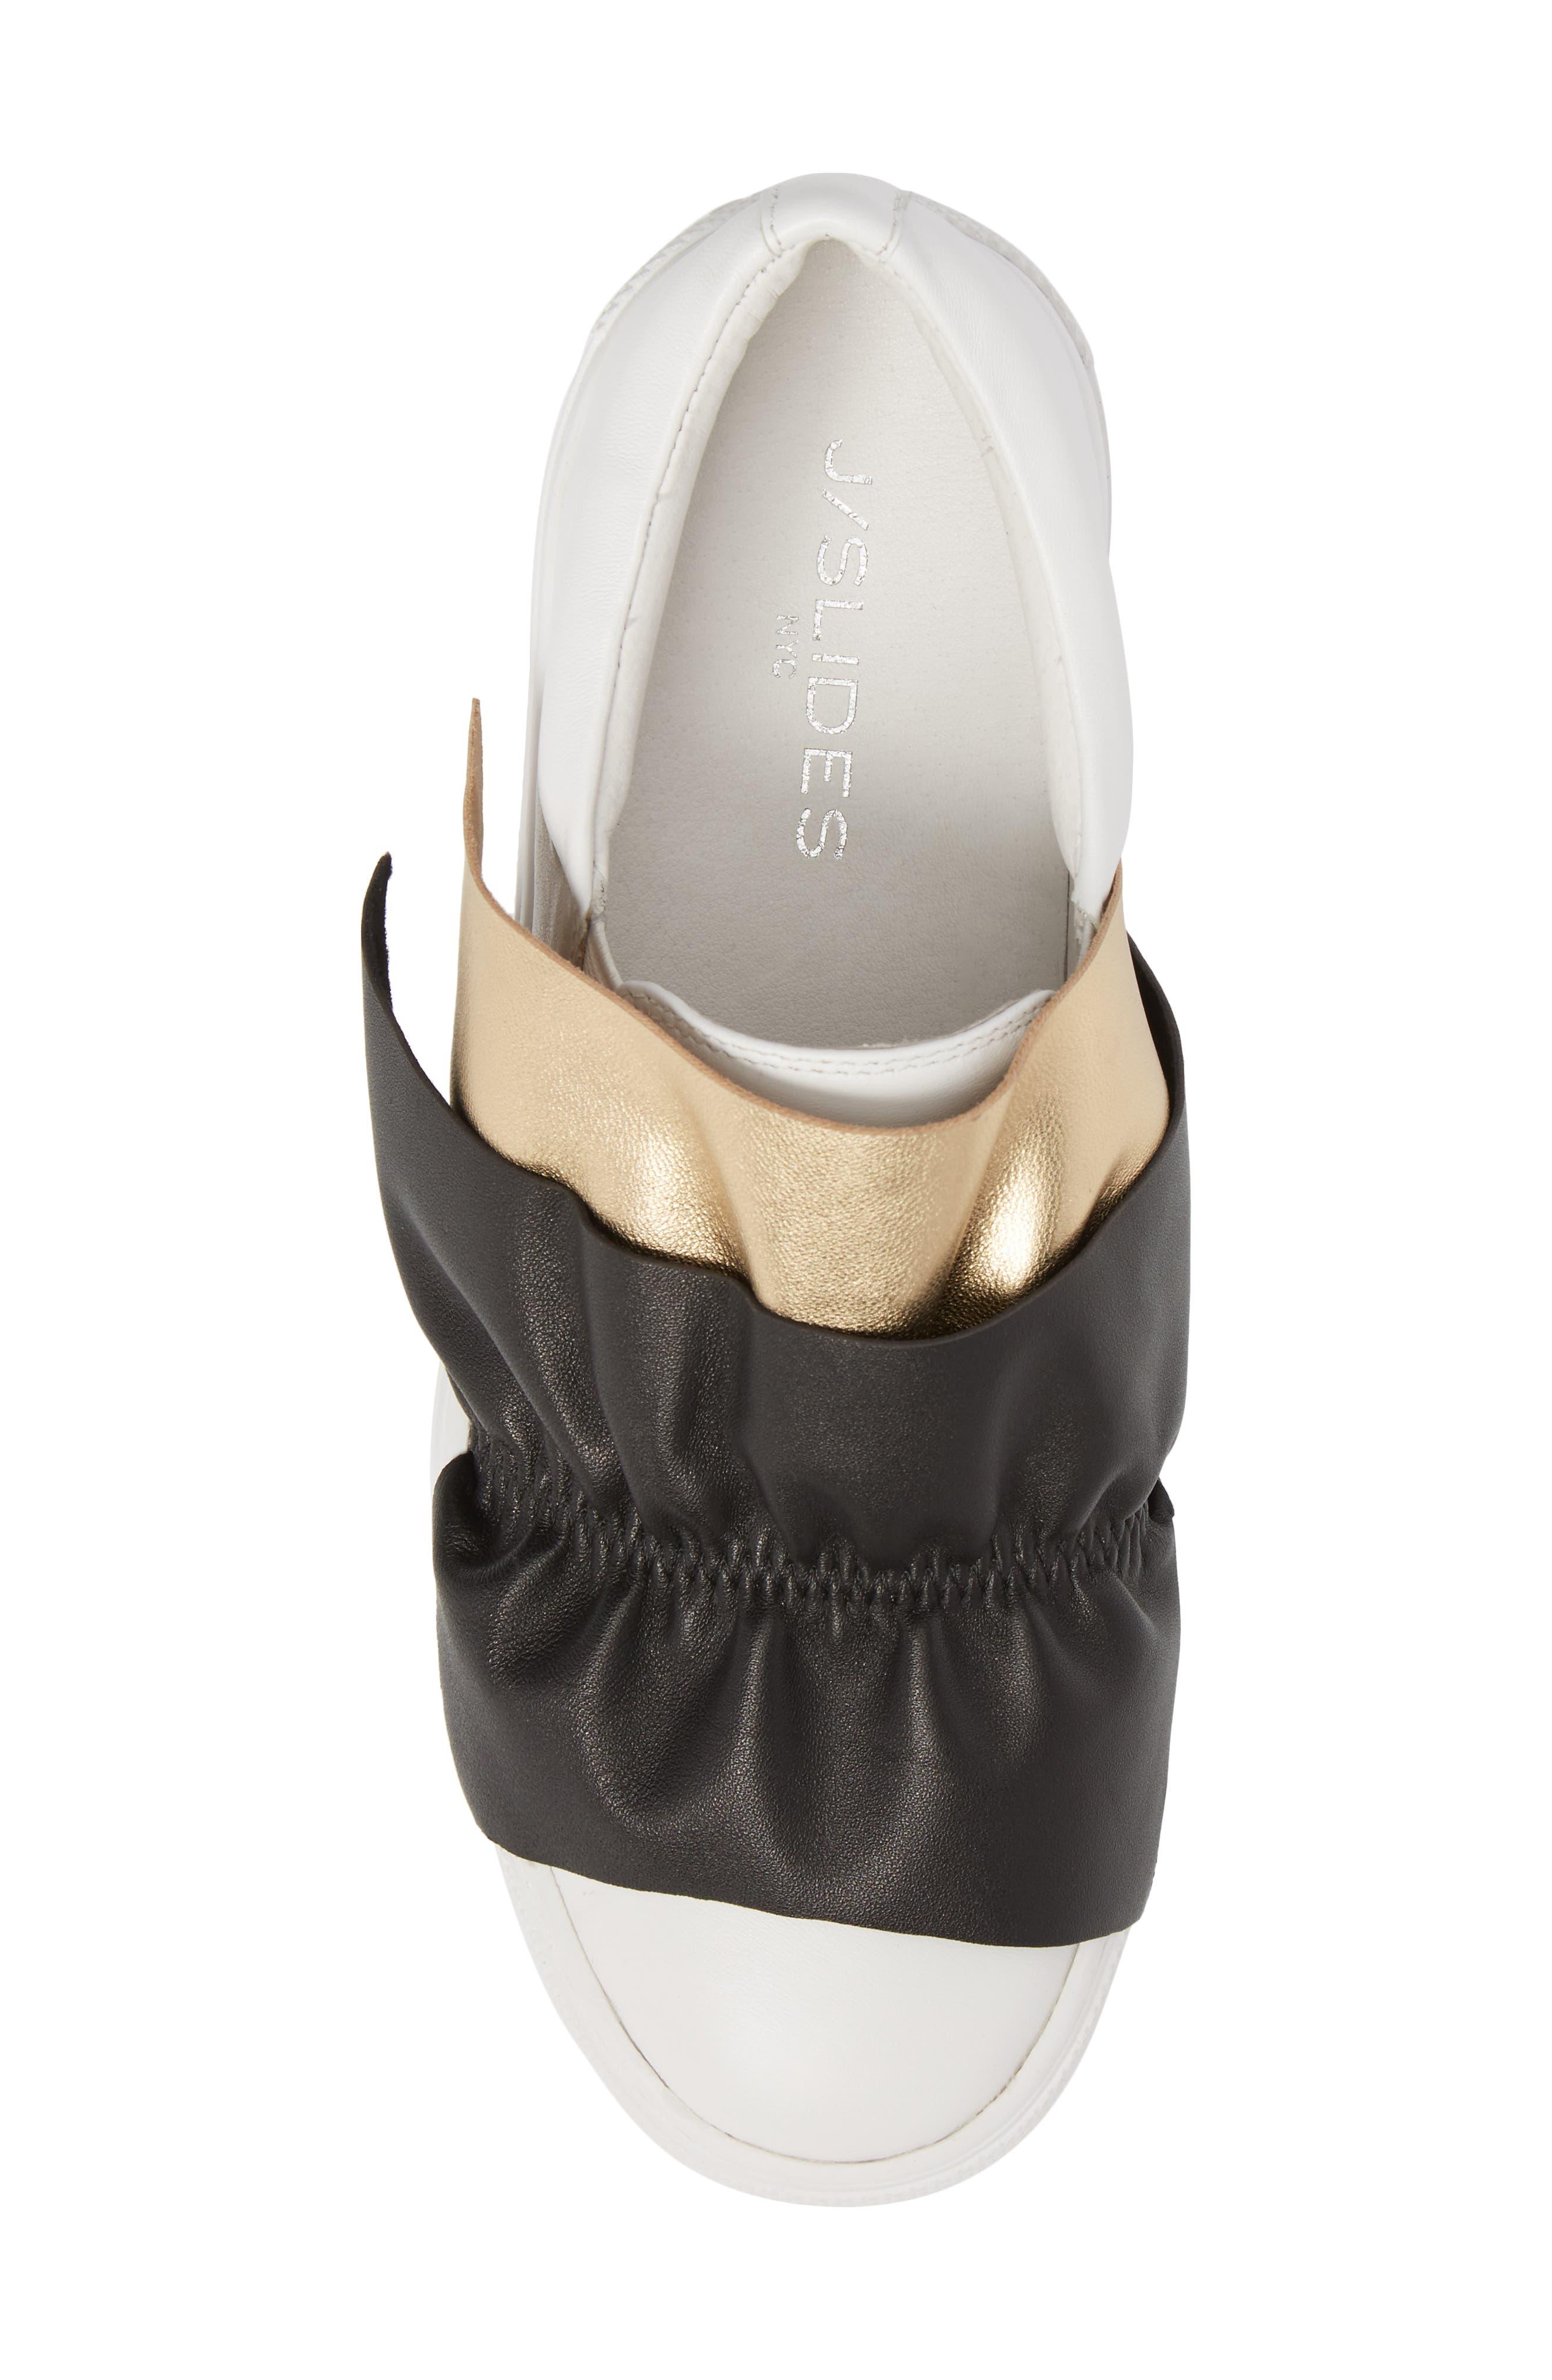 Sadie Ruffle Platform Sneaker,                             Alternate thumbnail 5, color,                             WHITE LEATHER